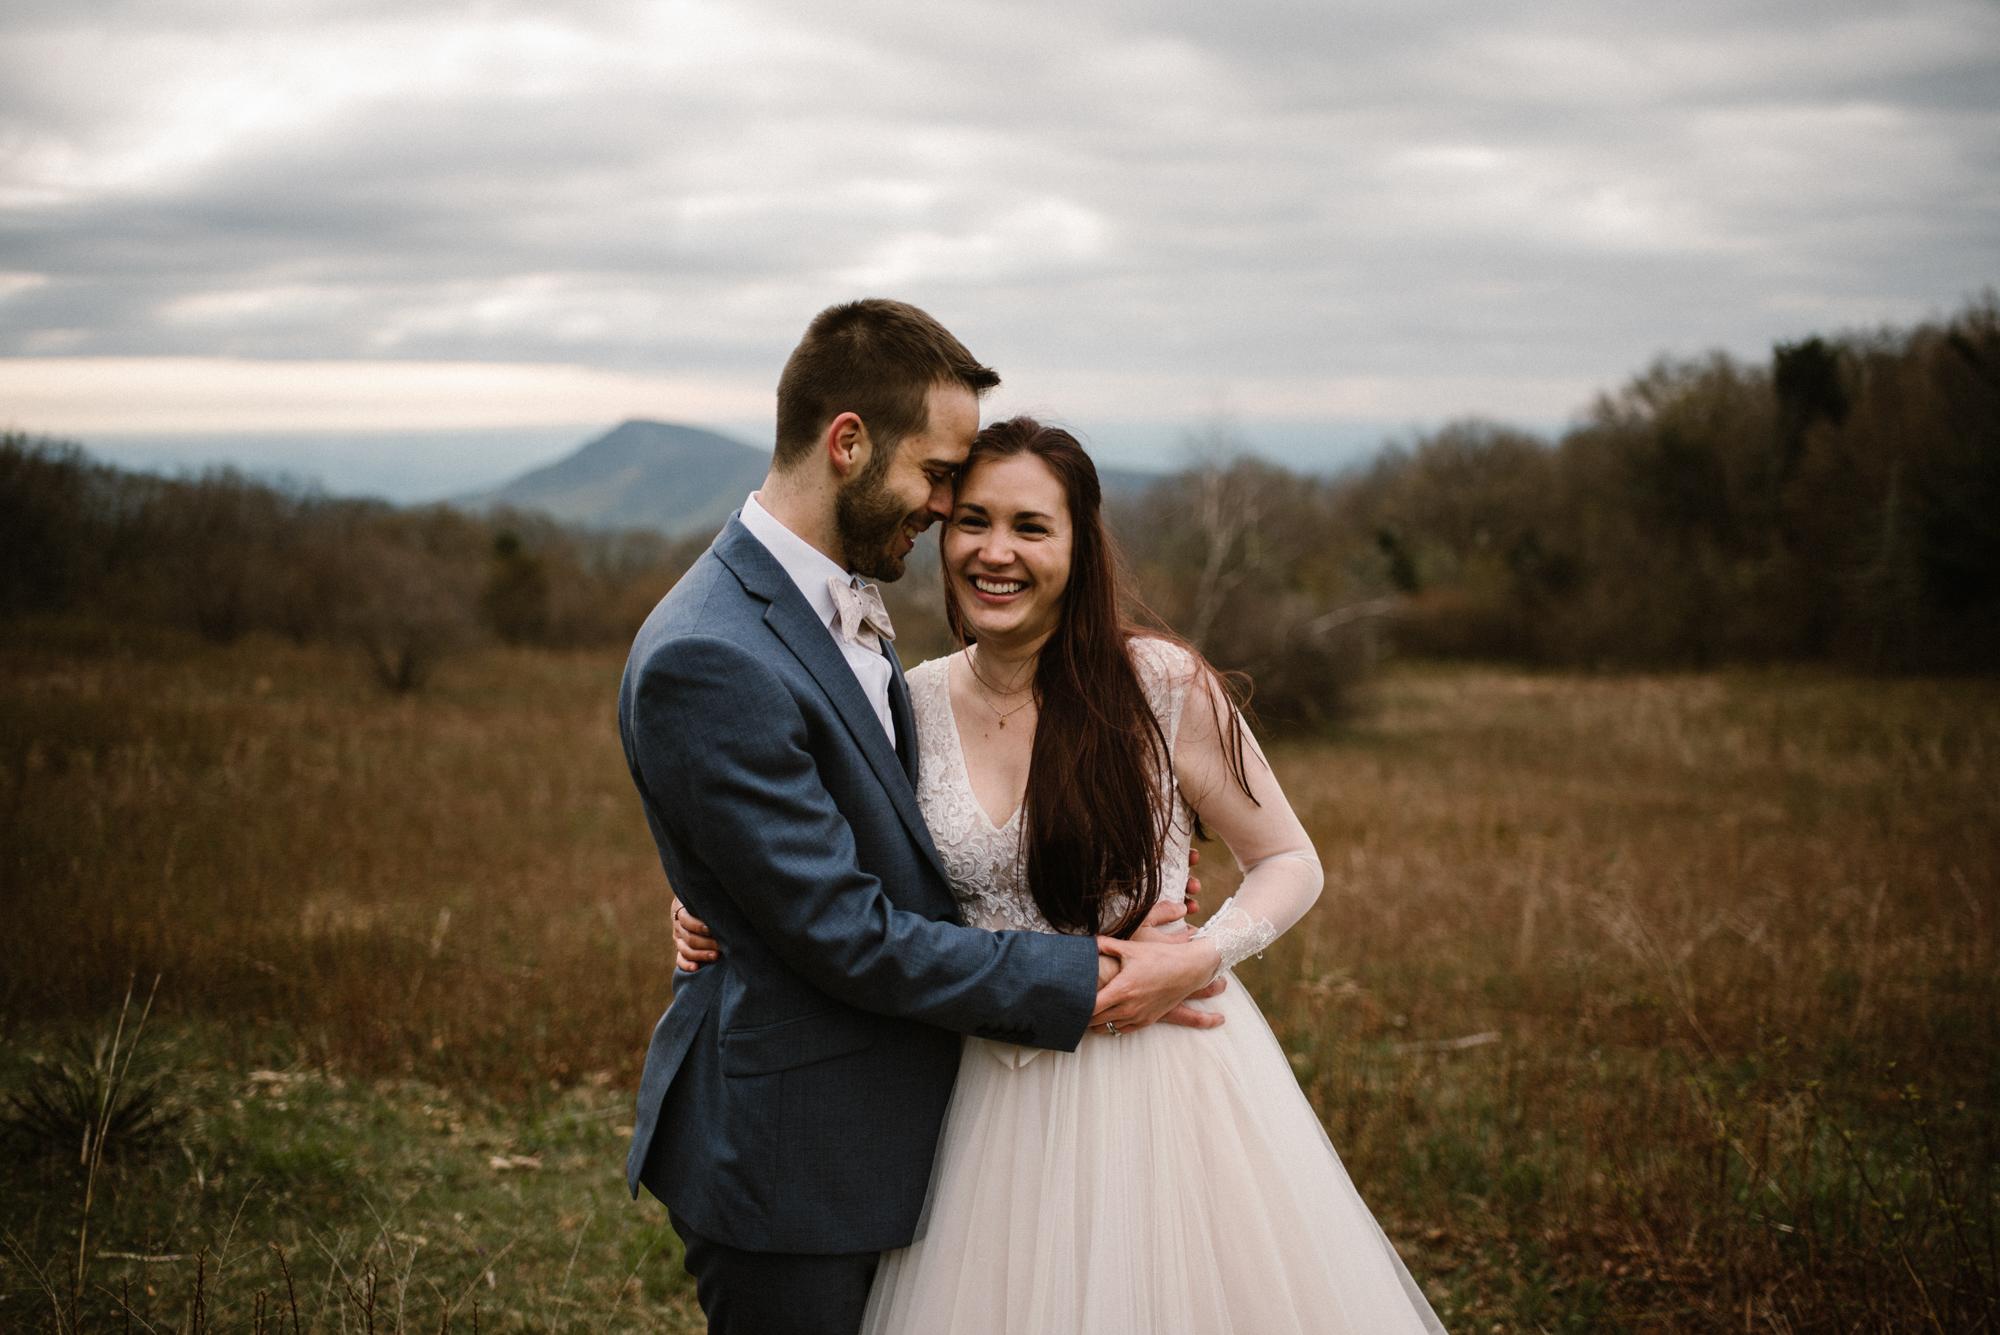 Paula and Andrew - Small Adventurous Wedding in Shenandoah National Park - Blue Ridge Mountain Wedding - White Sails Creative - Mountain Elopement_40.jpg